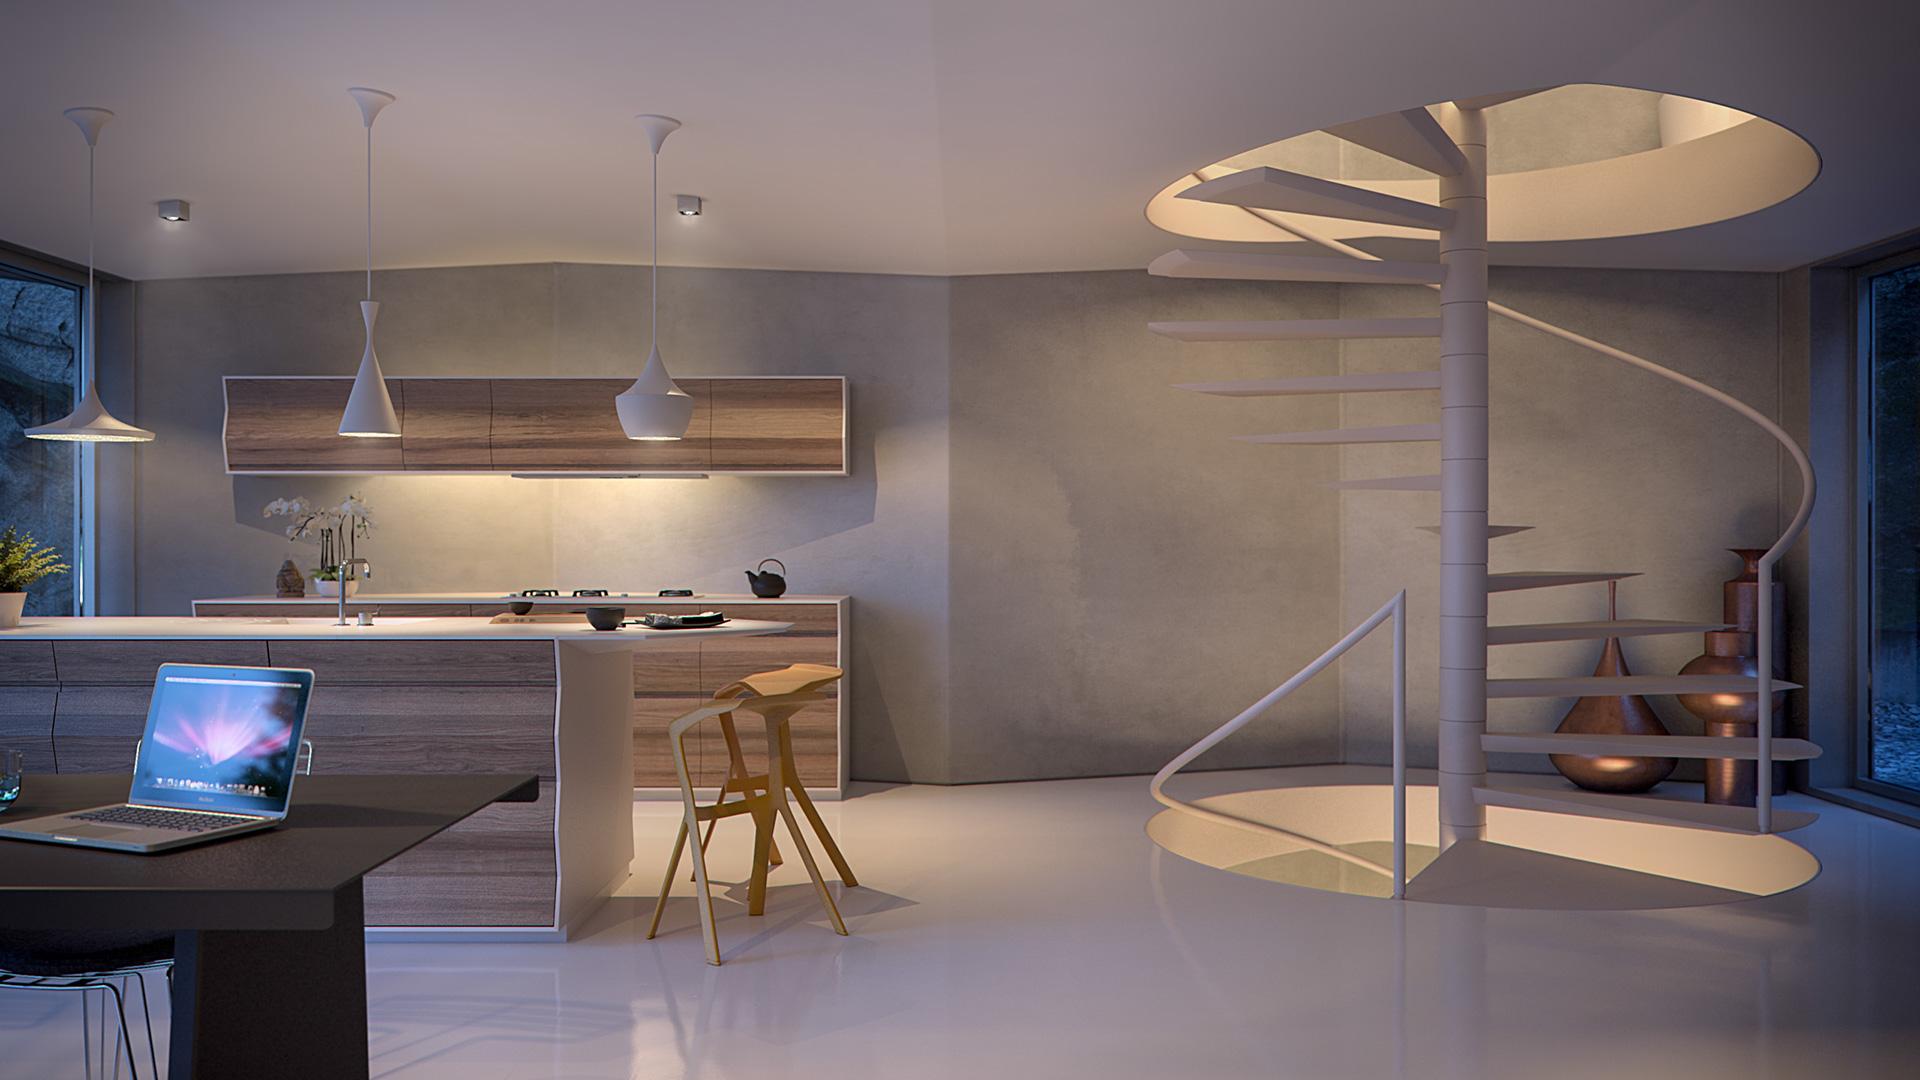 interiør design Origami Huset – Interiør Design « Bpositive 3D interiør design